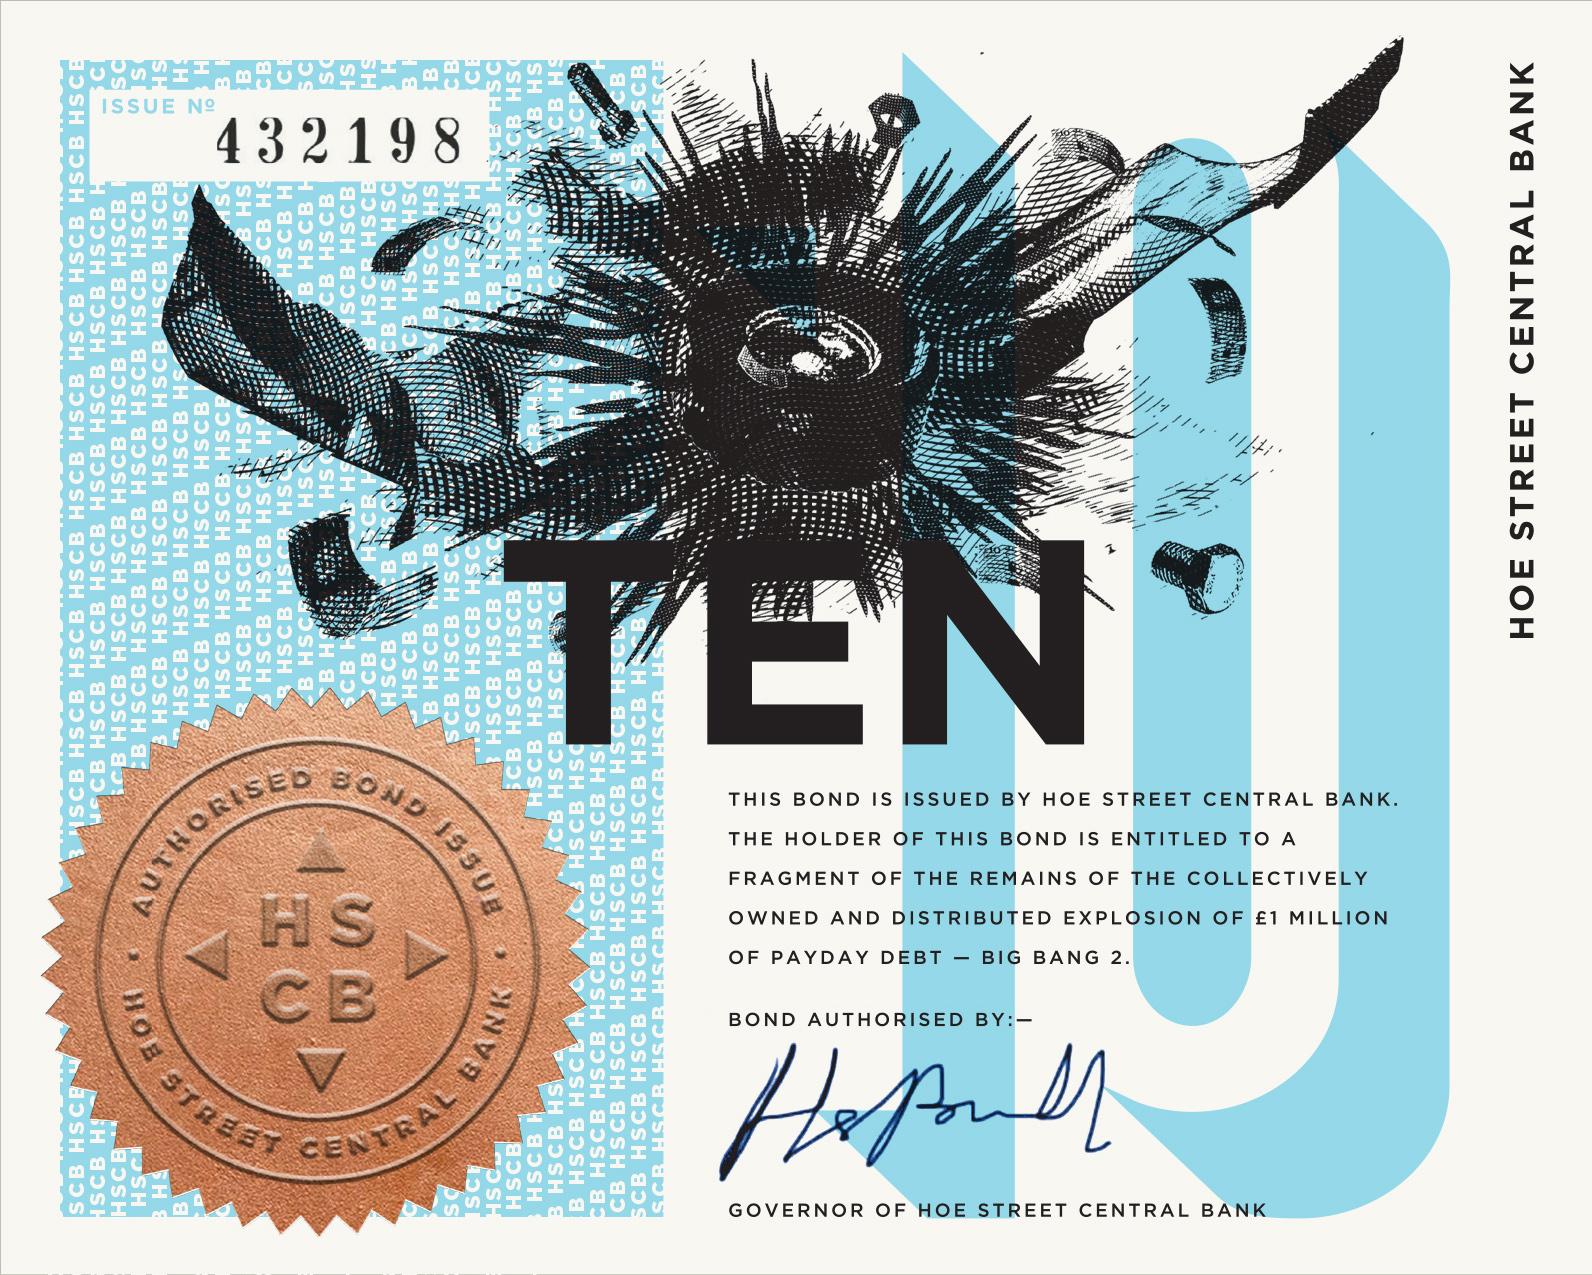 £10 HSCB BOND. 135X108mm. Blue. Screenprint, letterpress, foilblock, company seal. Stockwell 200gsm paper. Gilt edge.   BUY £10 BOND  . The above is a digital mockup. Return: fragment.